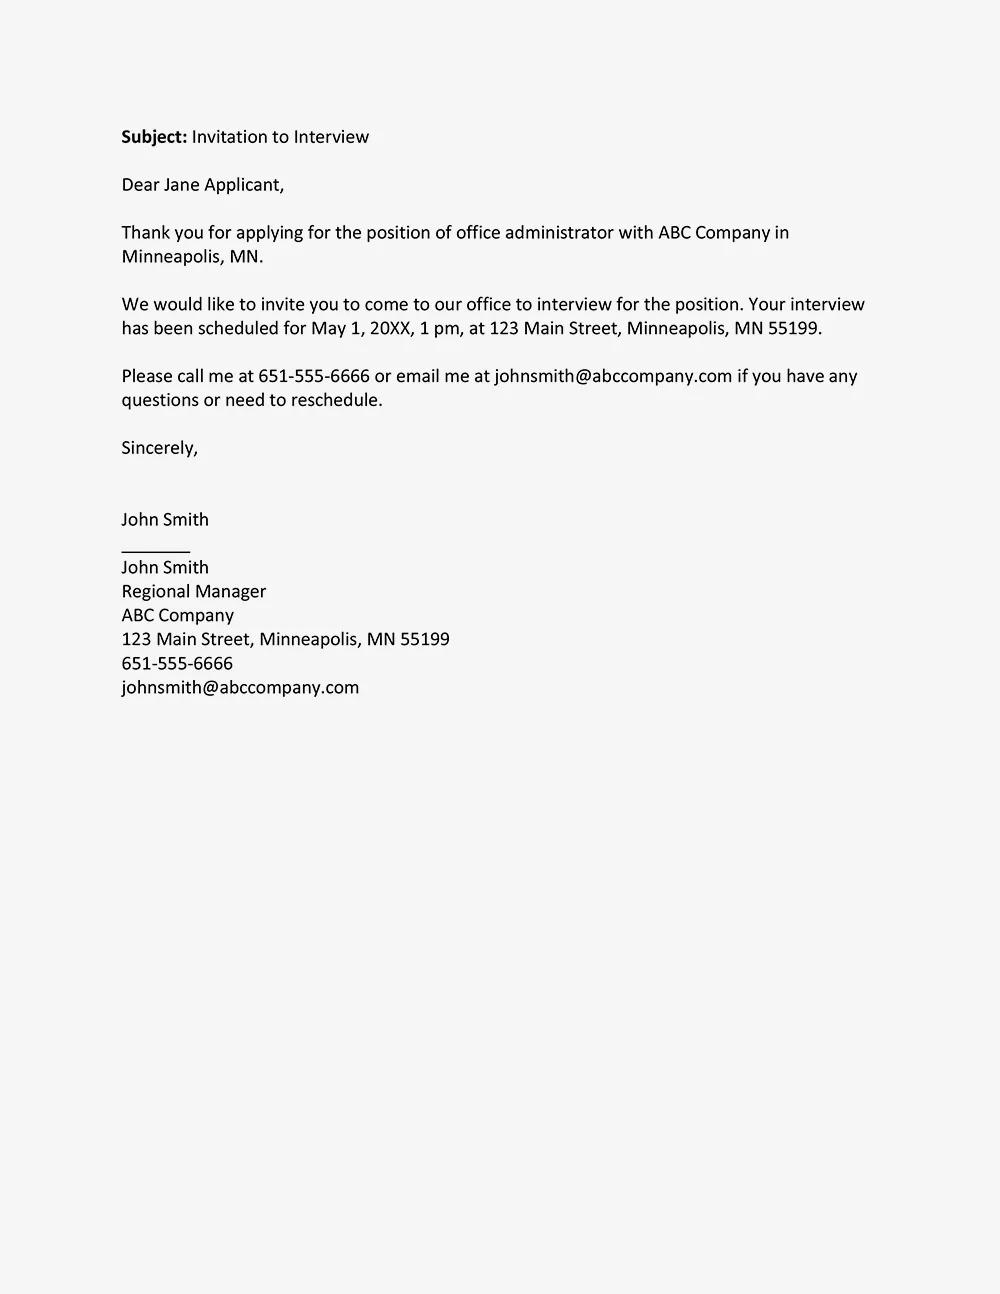 job interview invitation letter